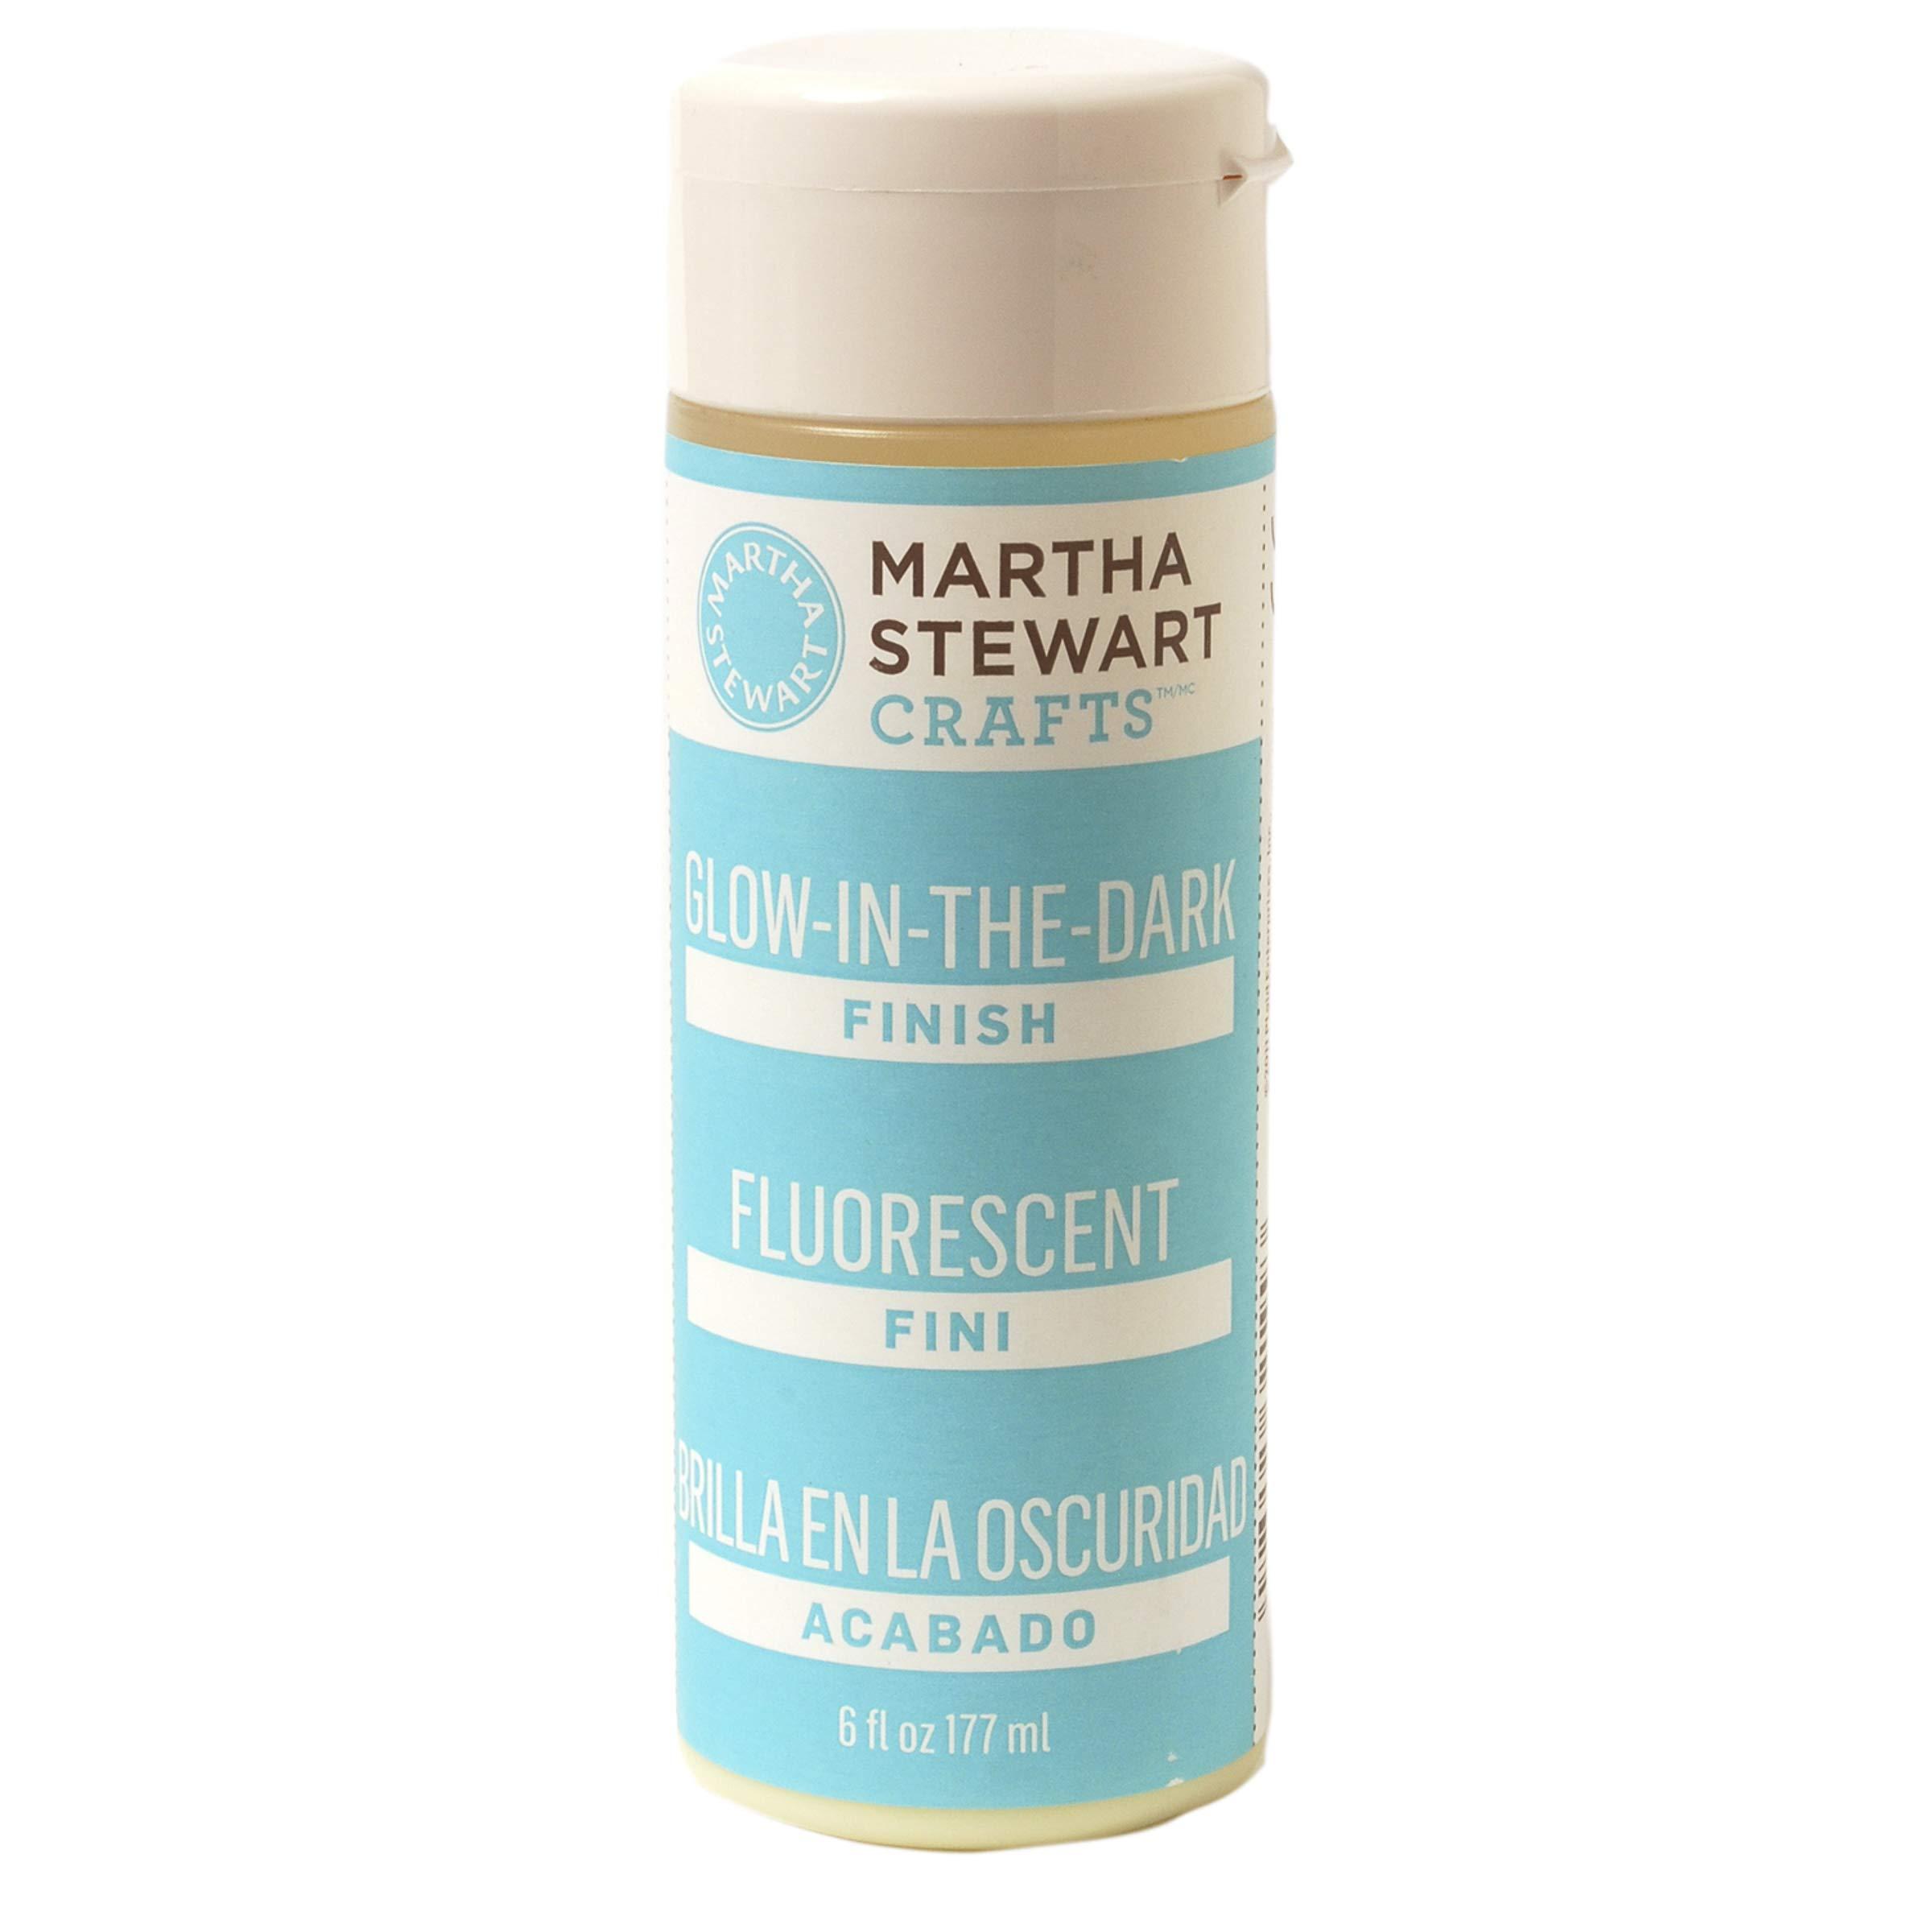 Martha Stewart Crafts Martha Stewart Glow-in-The-Dark Finish, 6 Ounces Paint, 6 oz